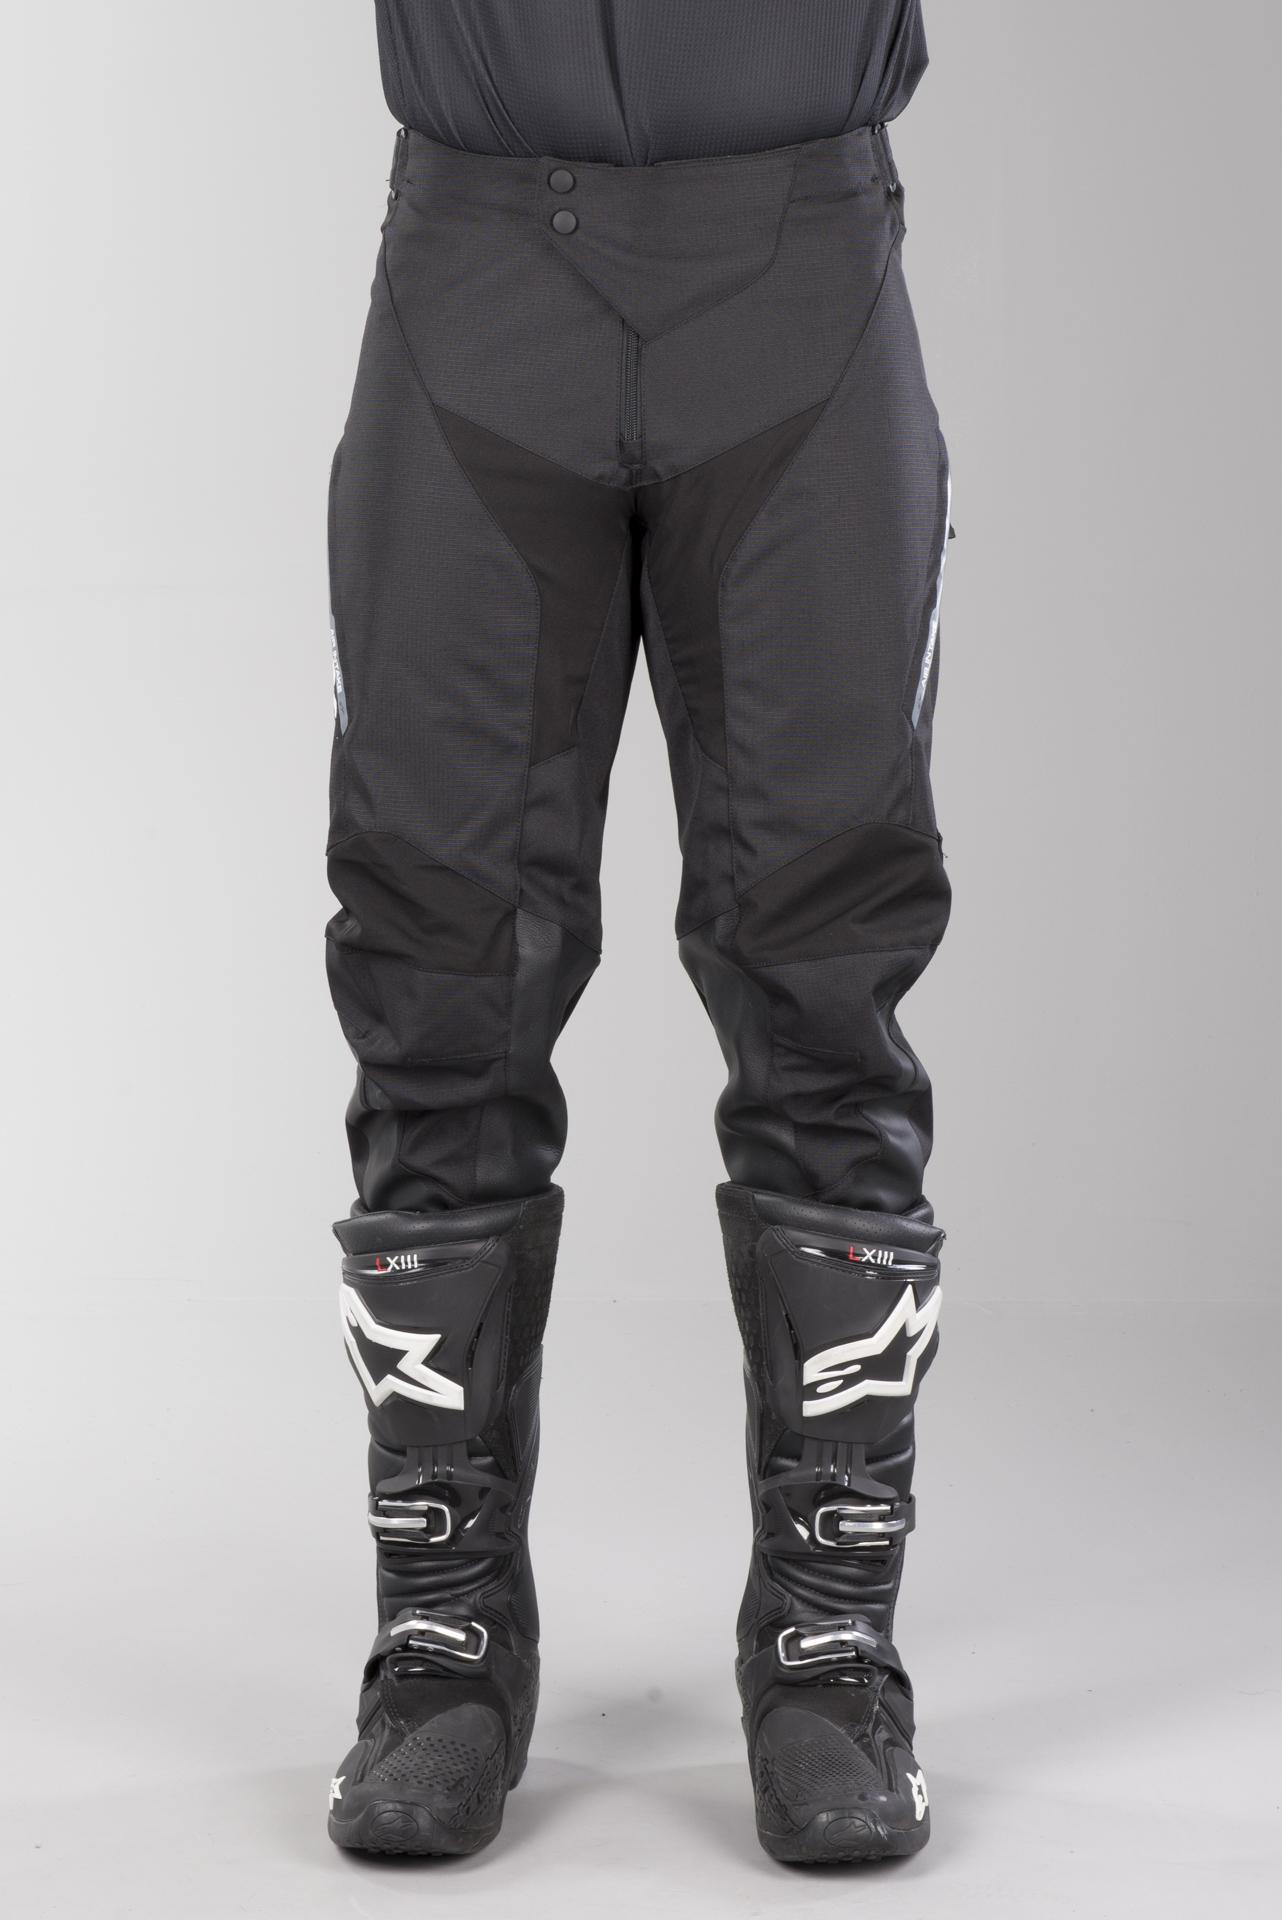 Alpinestars Venture R MX Enduro Pants